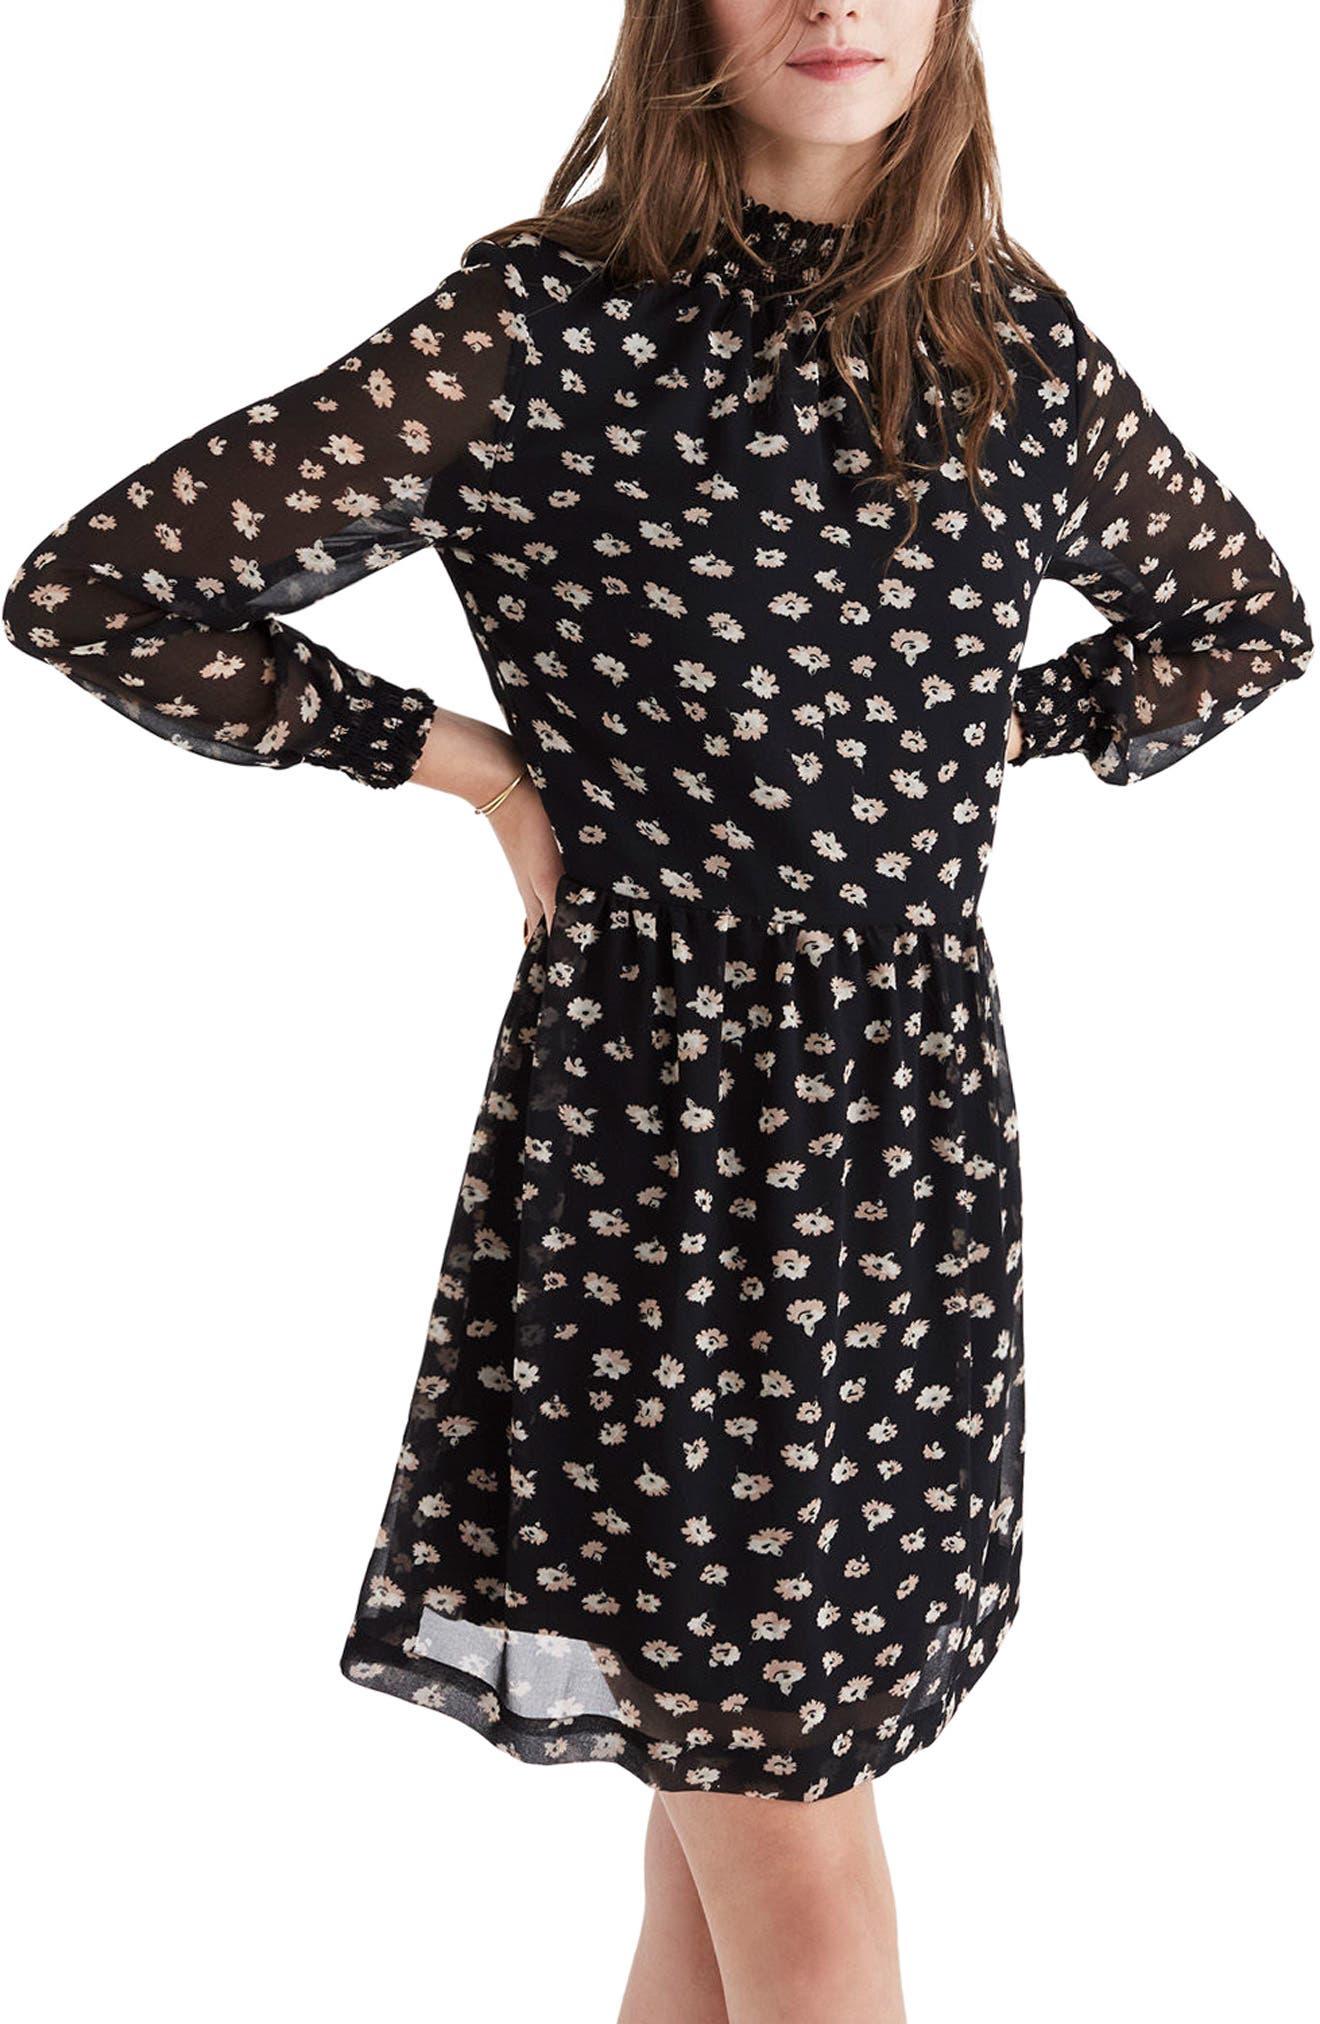 Mistlight Mock Neck Dress,                         Main,                         color, Seattle Floral True Black